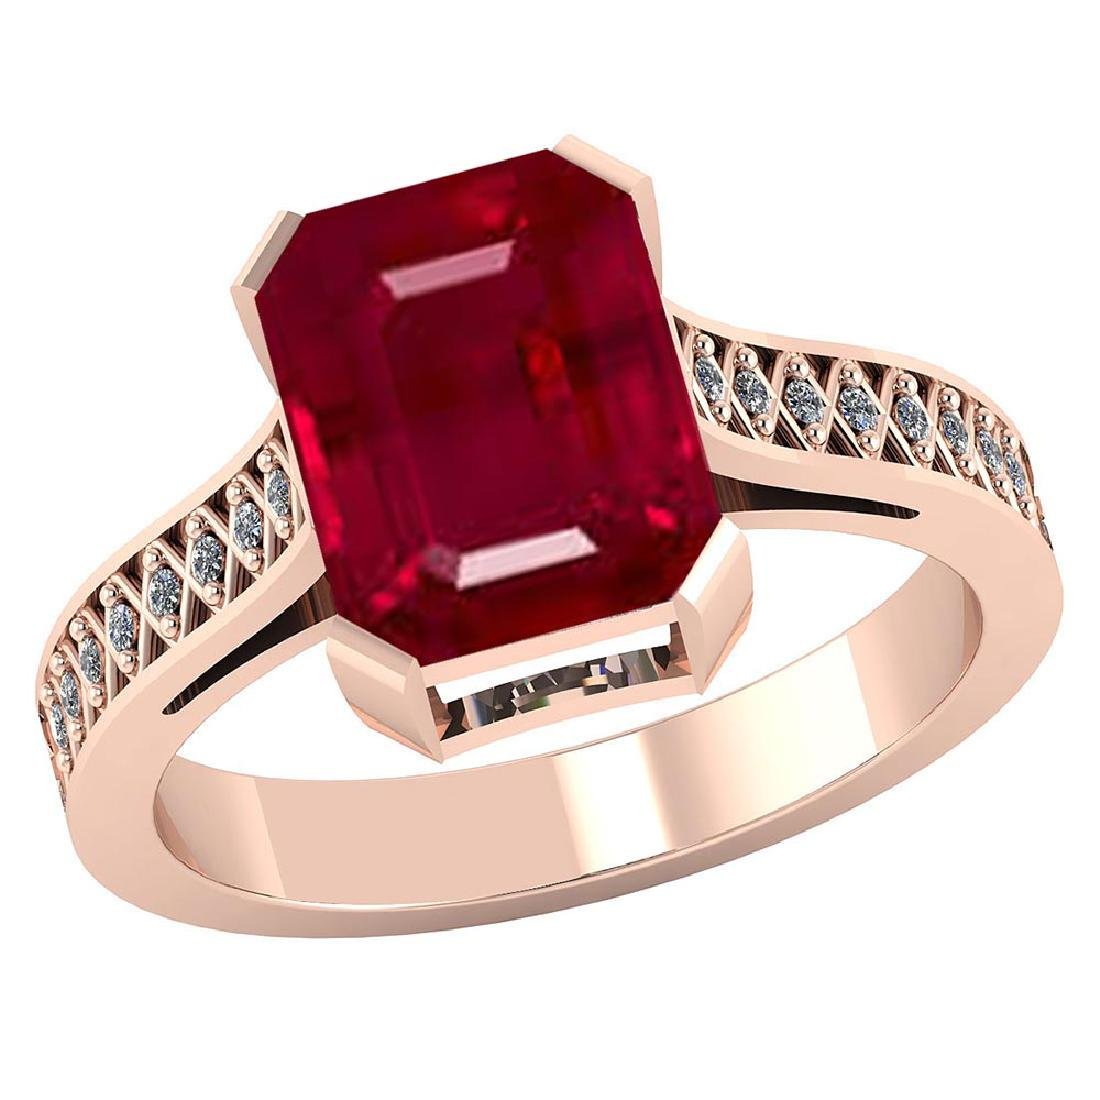 Certified 2.85 CTW Genuine Ruby And Diamond 14K Rose Go